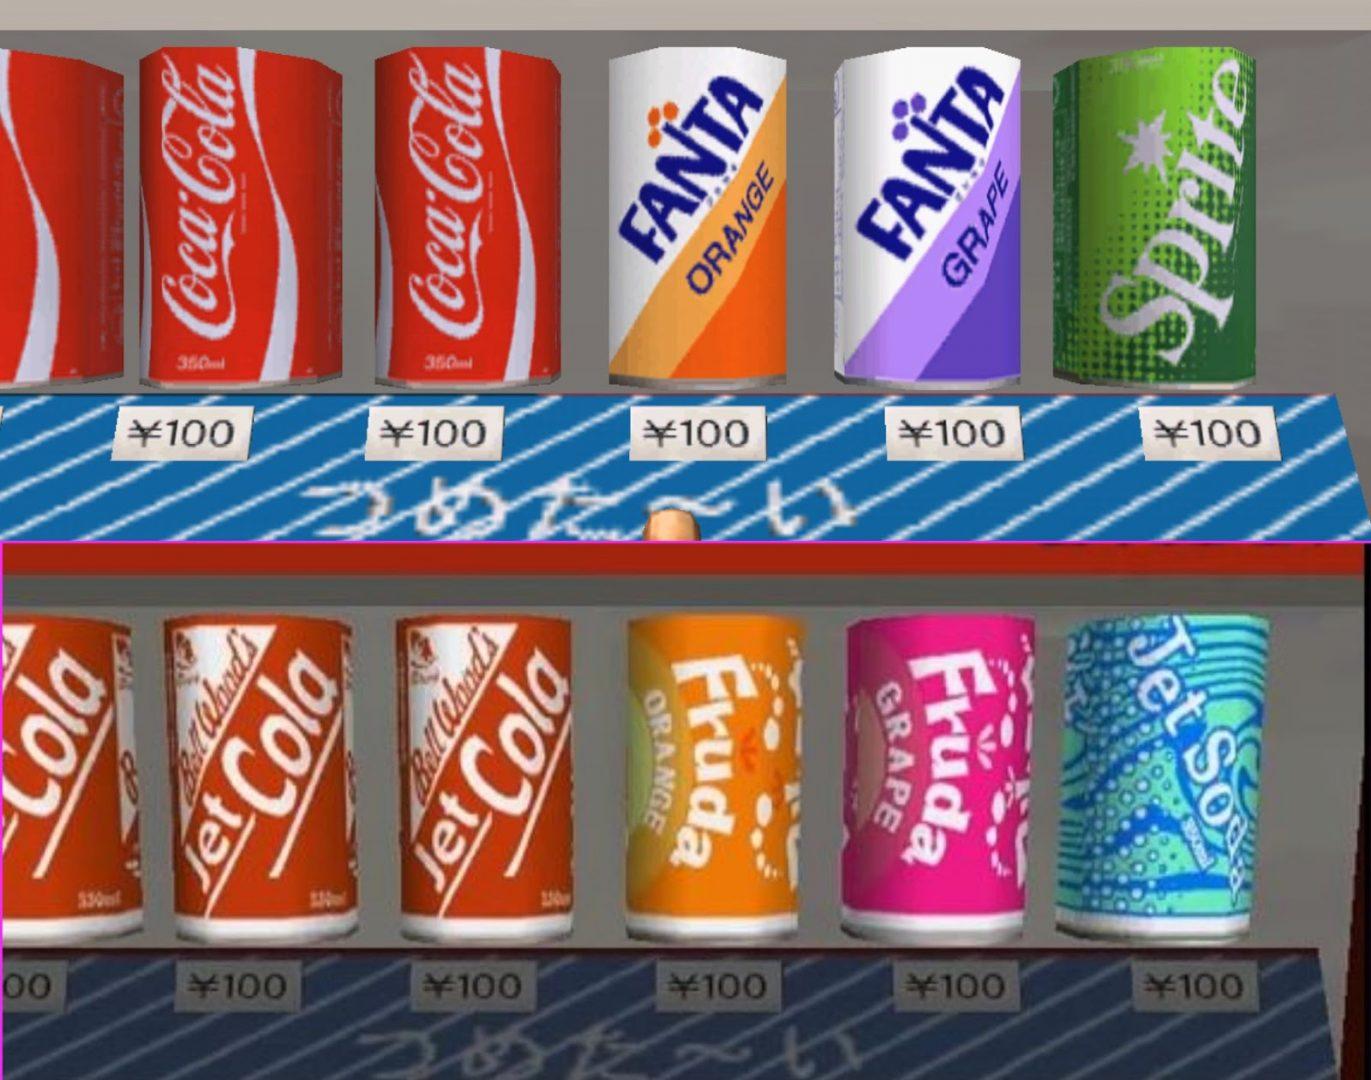 coca-cola-she-said.jpg